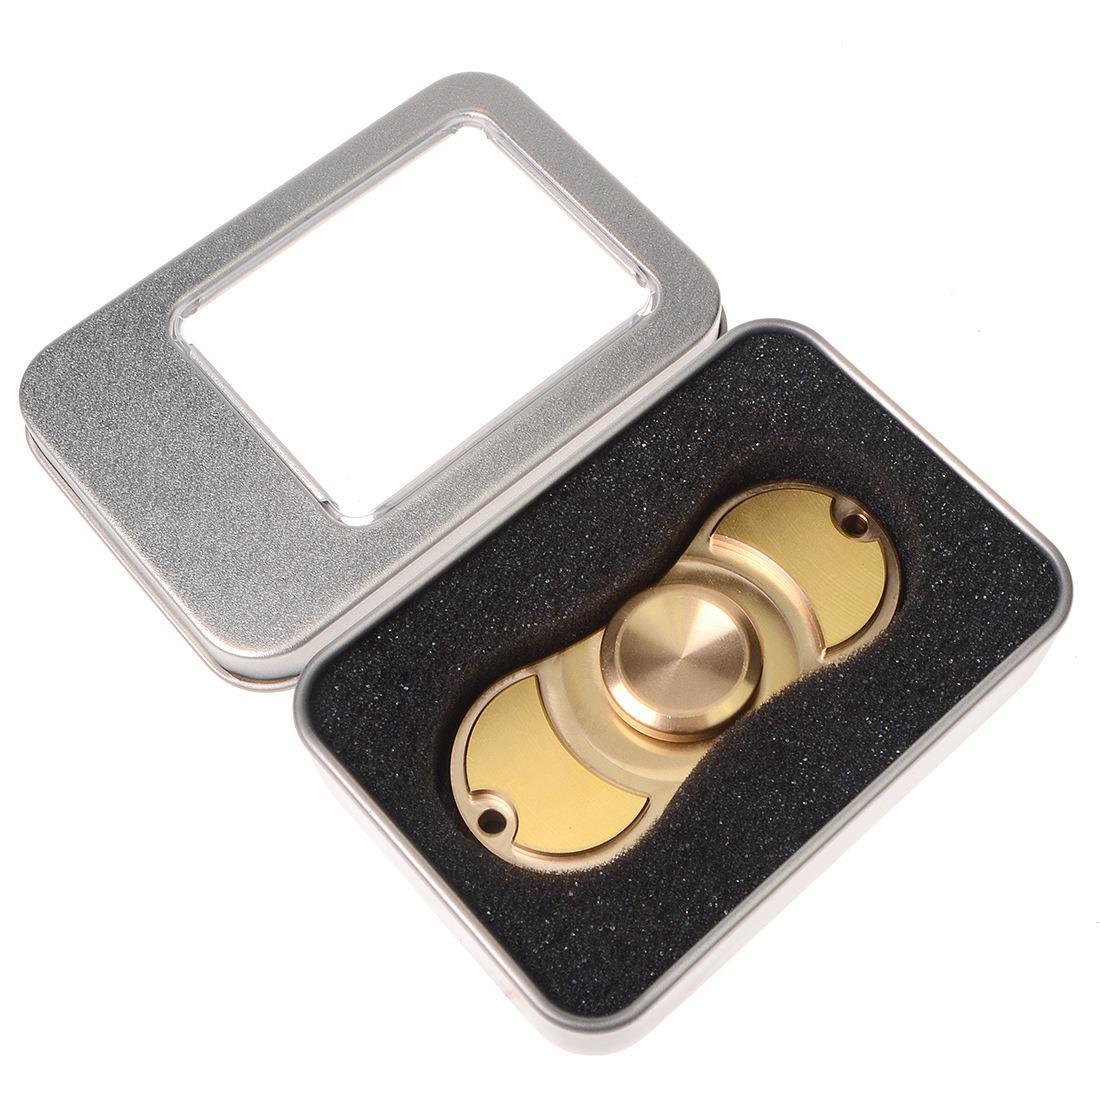 Pure Brass Fidget Toy Over 4 Mins Hand Finger Spinner